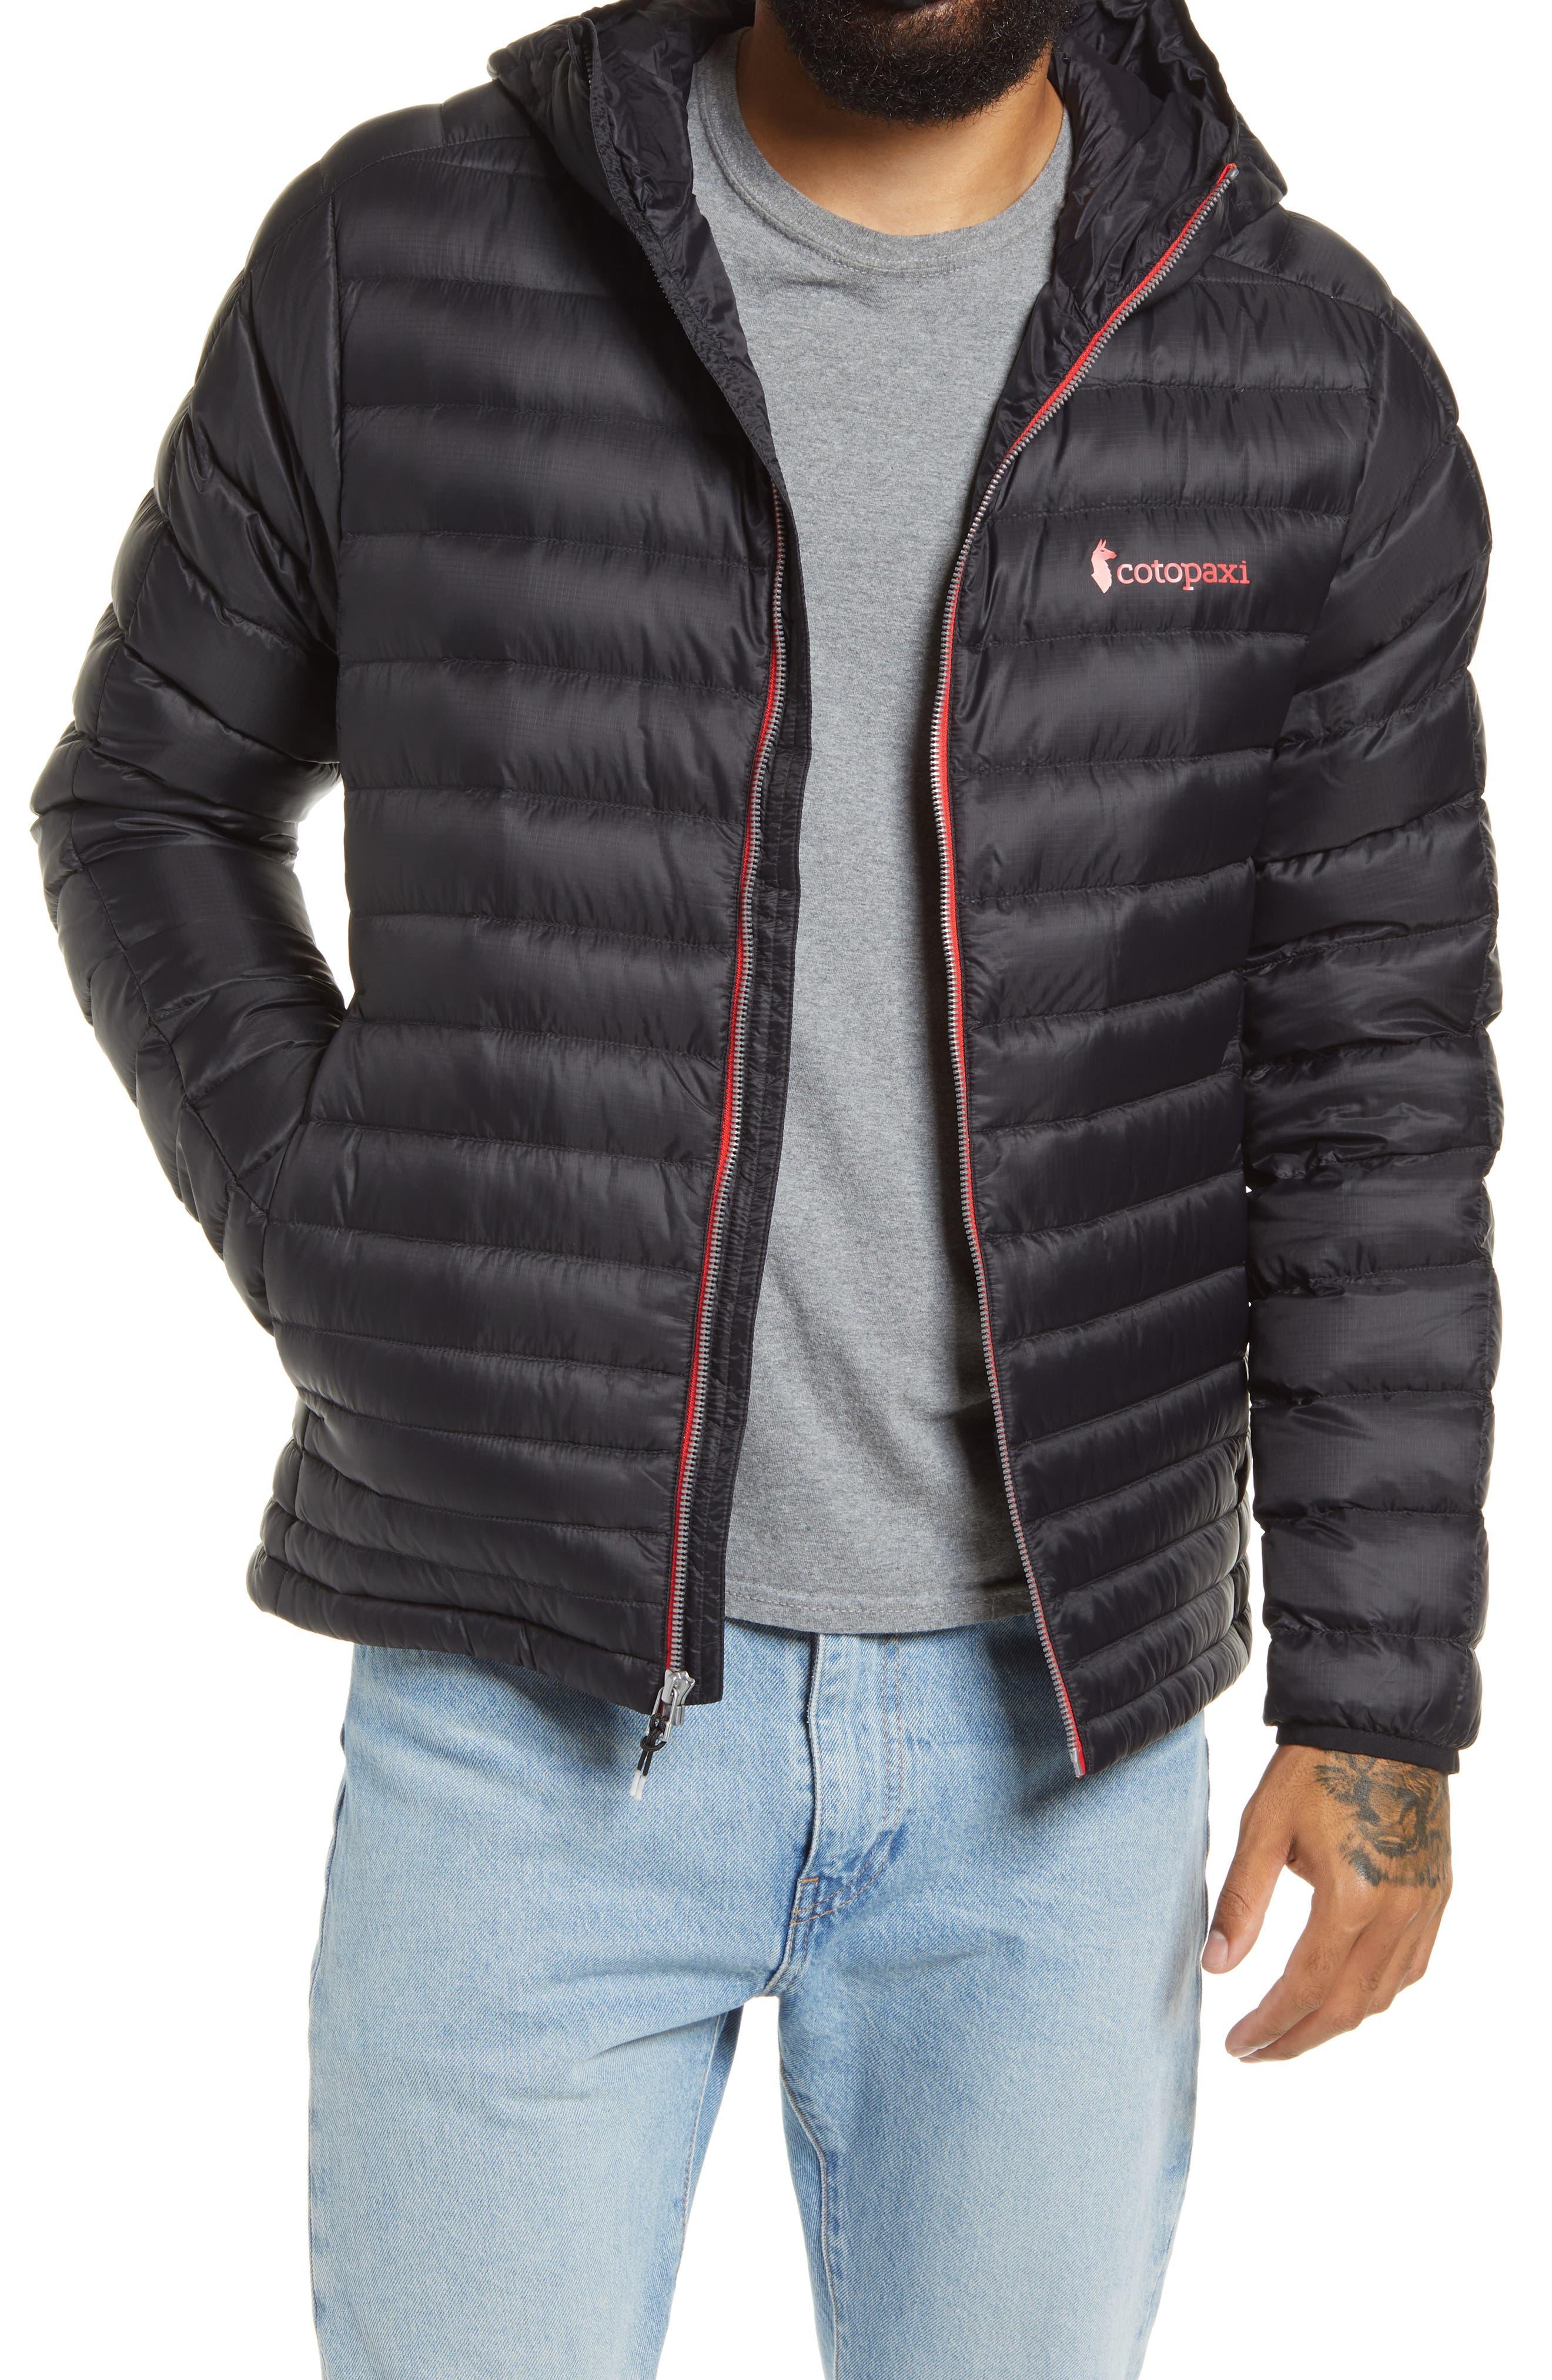 Men's Fuego Hooded Water Resistant Down Jacket